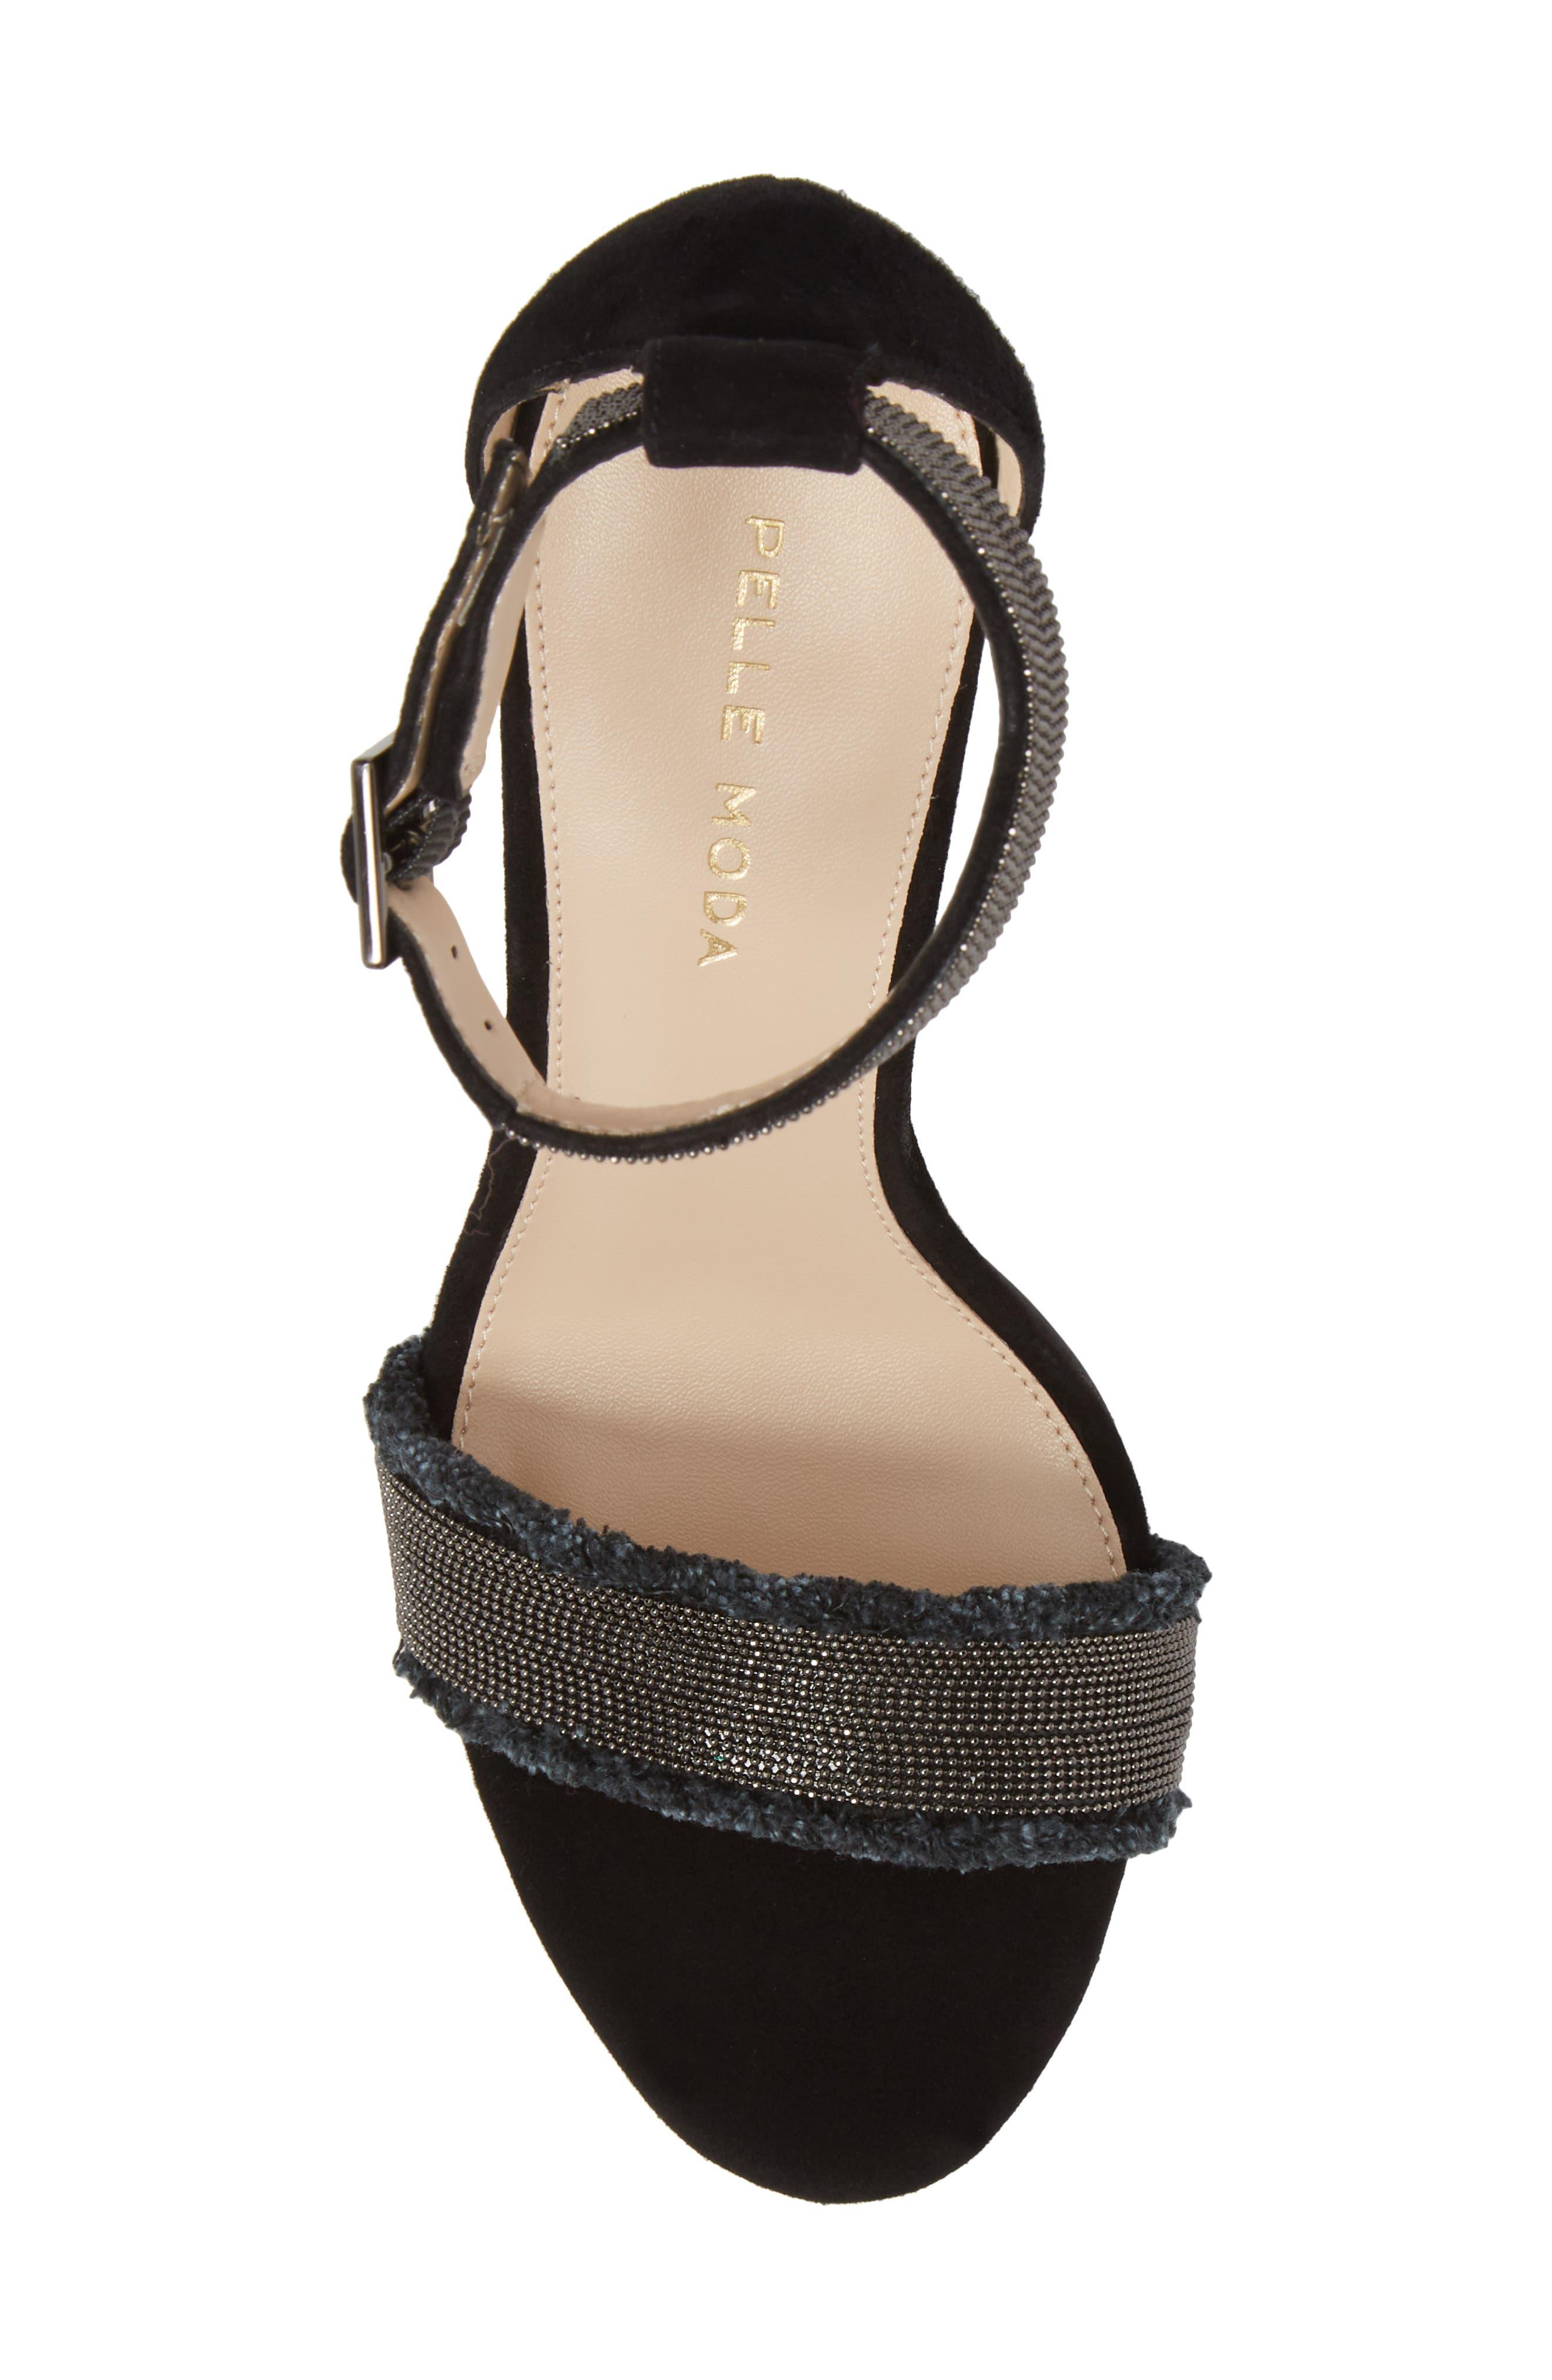 PELLE MODA,                             Bonnie6 Embellished Sandal,                             Alternate thumbnail 5, color,                             BLACK SUEDE